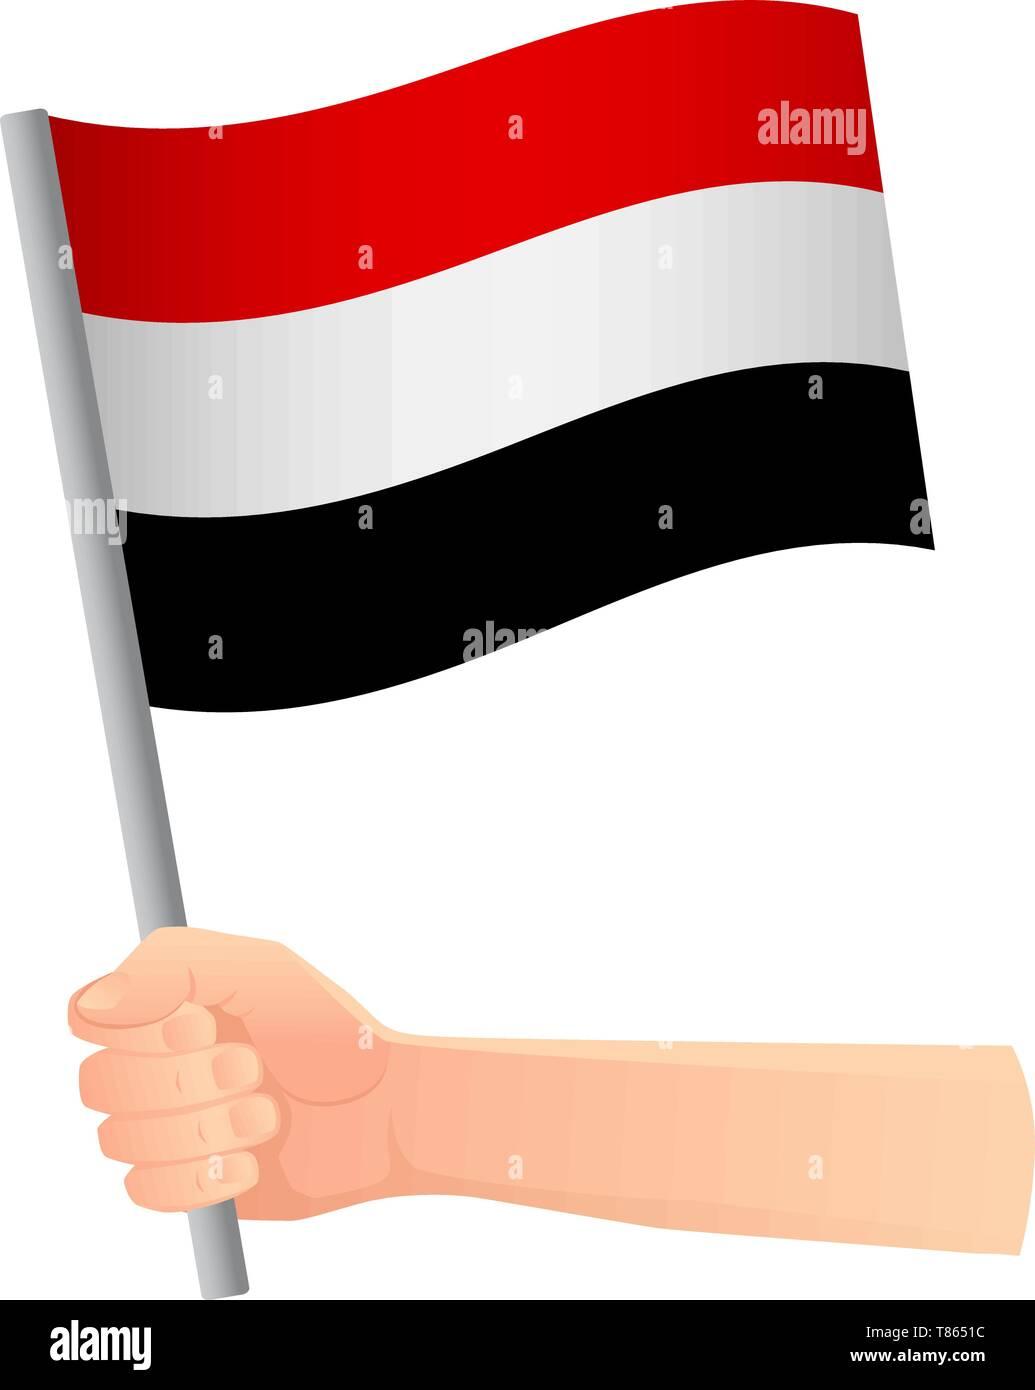 Yemen flag in hand. Patriotic background. National flag of Yemen vector illustration - Stock Image